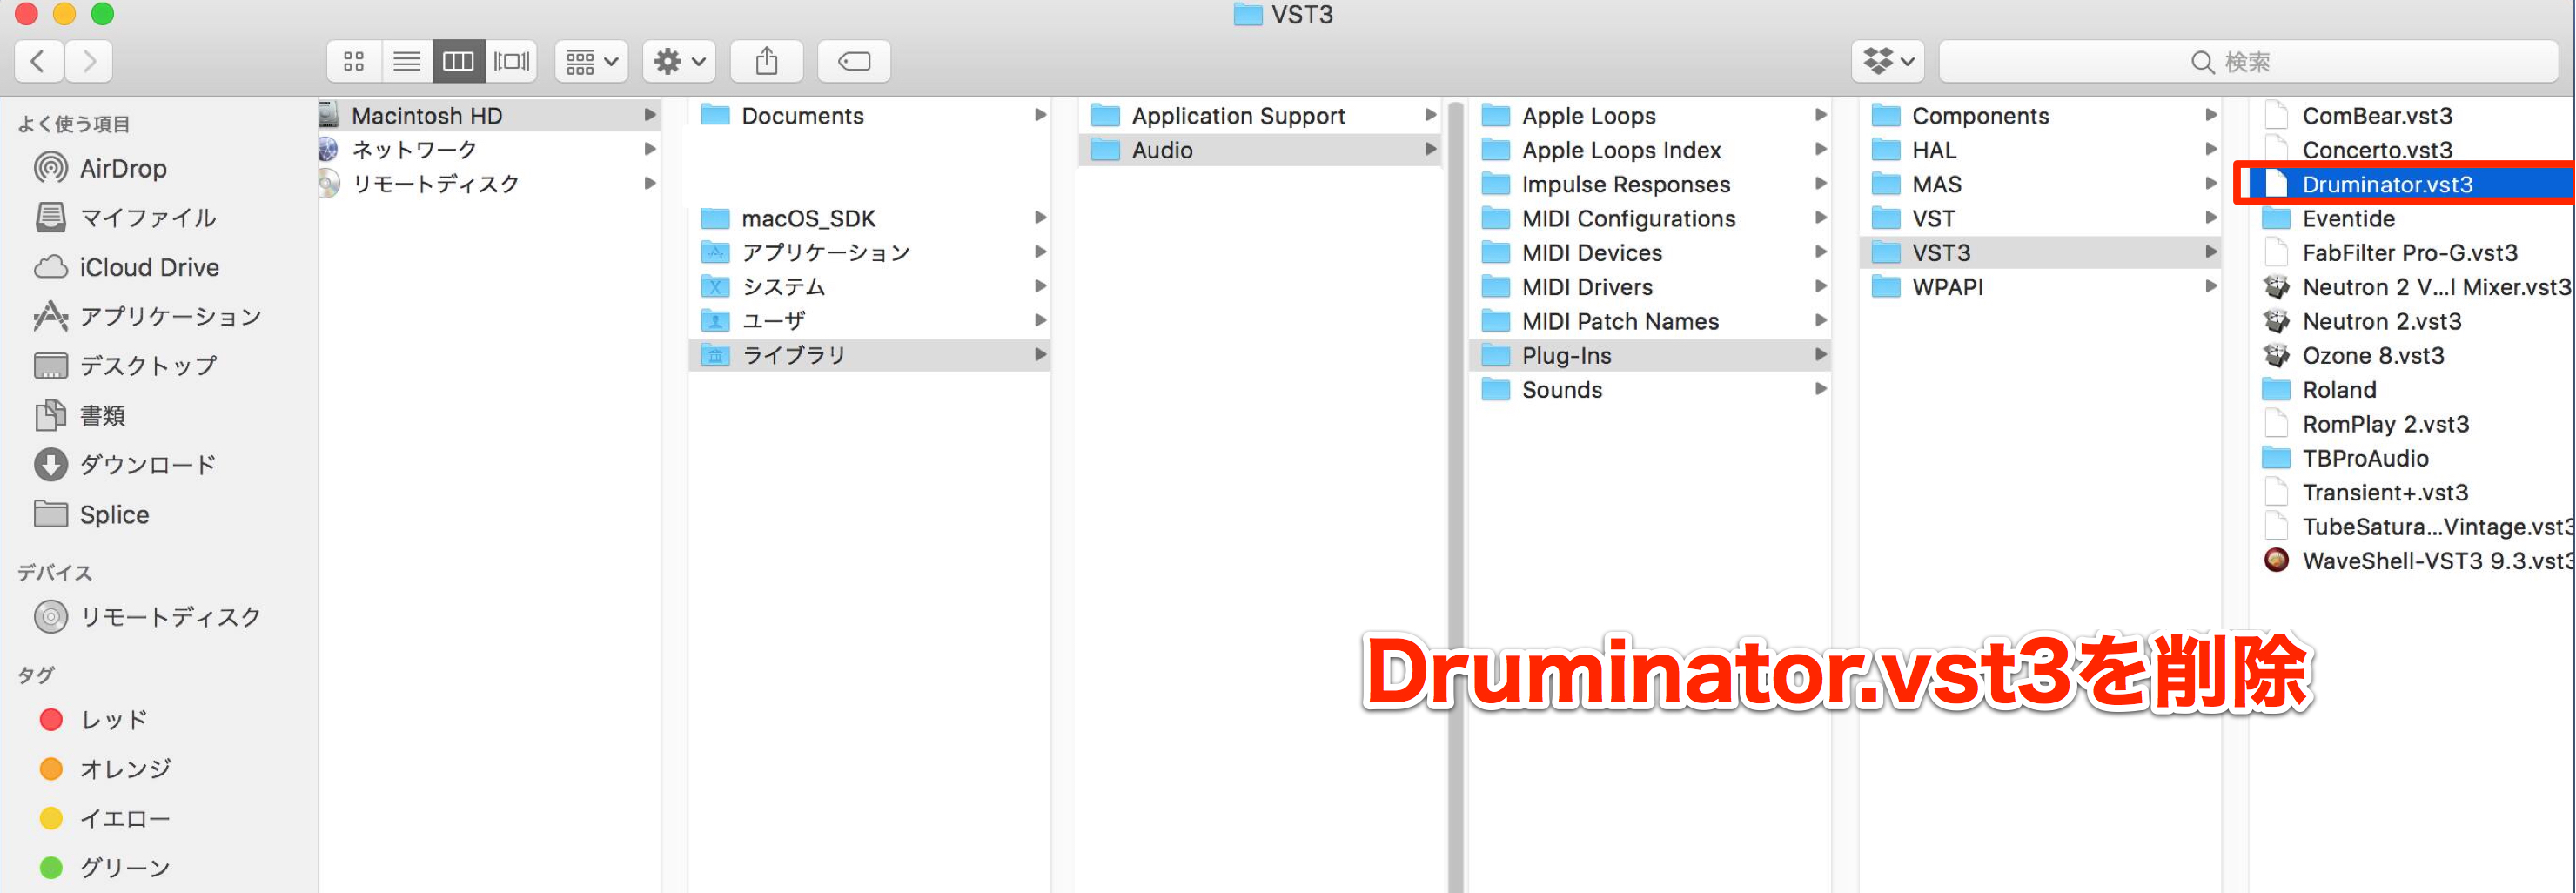 Druminator-VST3